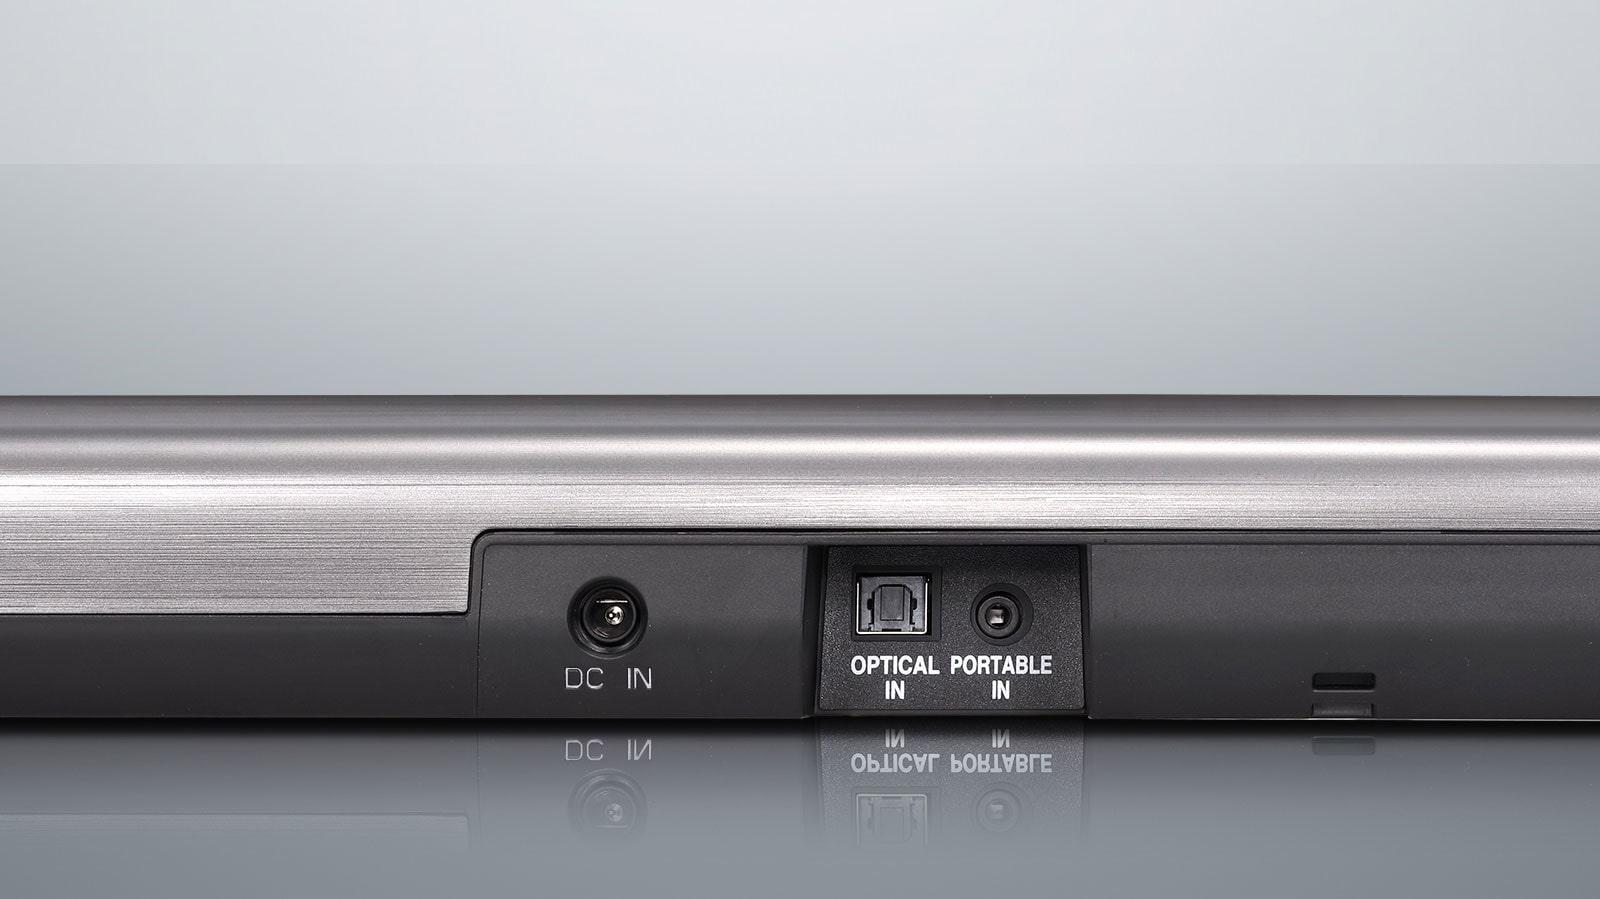 soundbar lg sj5 do tv bezprzewodowy subwoofer bluetooth i wi fi. Black Bedroom Furniture Sets. Home Design Ideas